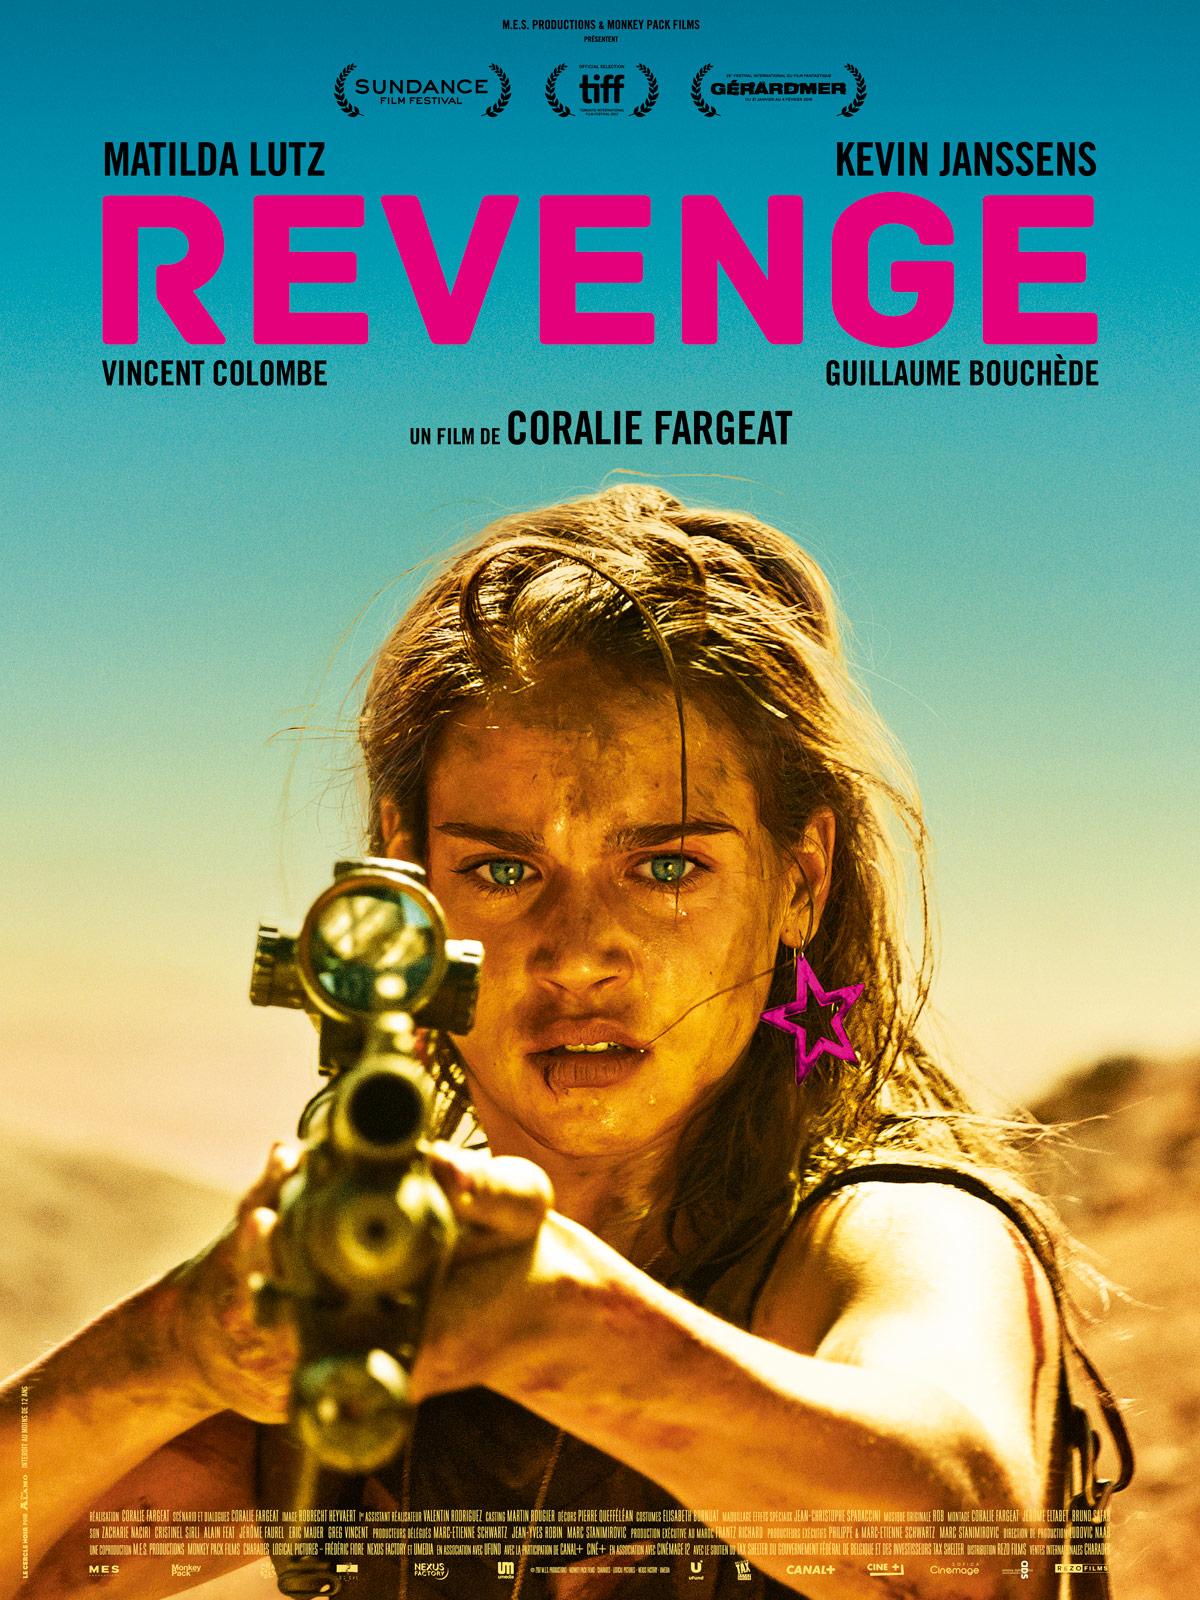 Page 70 - Revenge.jpeg